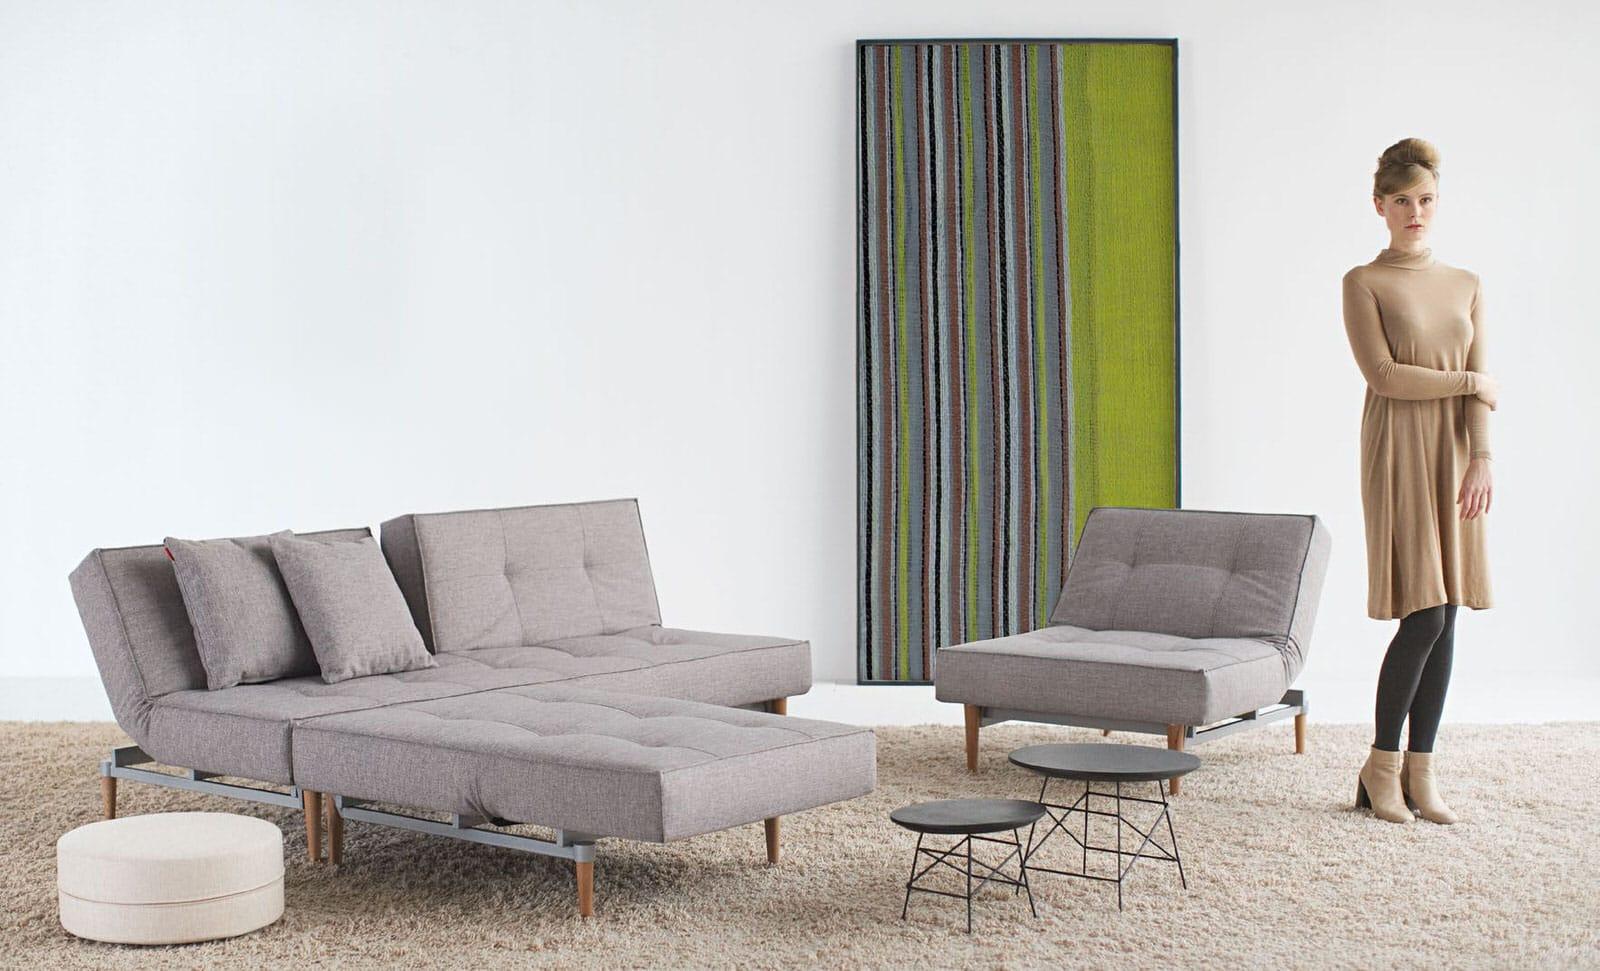 innovation sofa replacement cover uncategorized innovation sofa dublexo frej sleeper by home. Black Bedroom Furniture Sets. Home Design Ideas